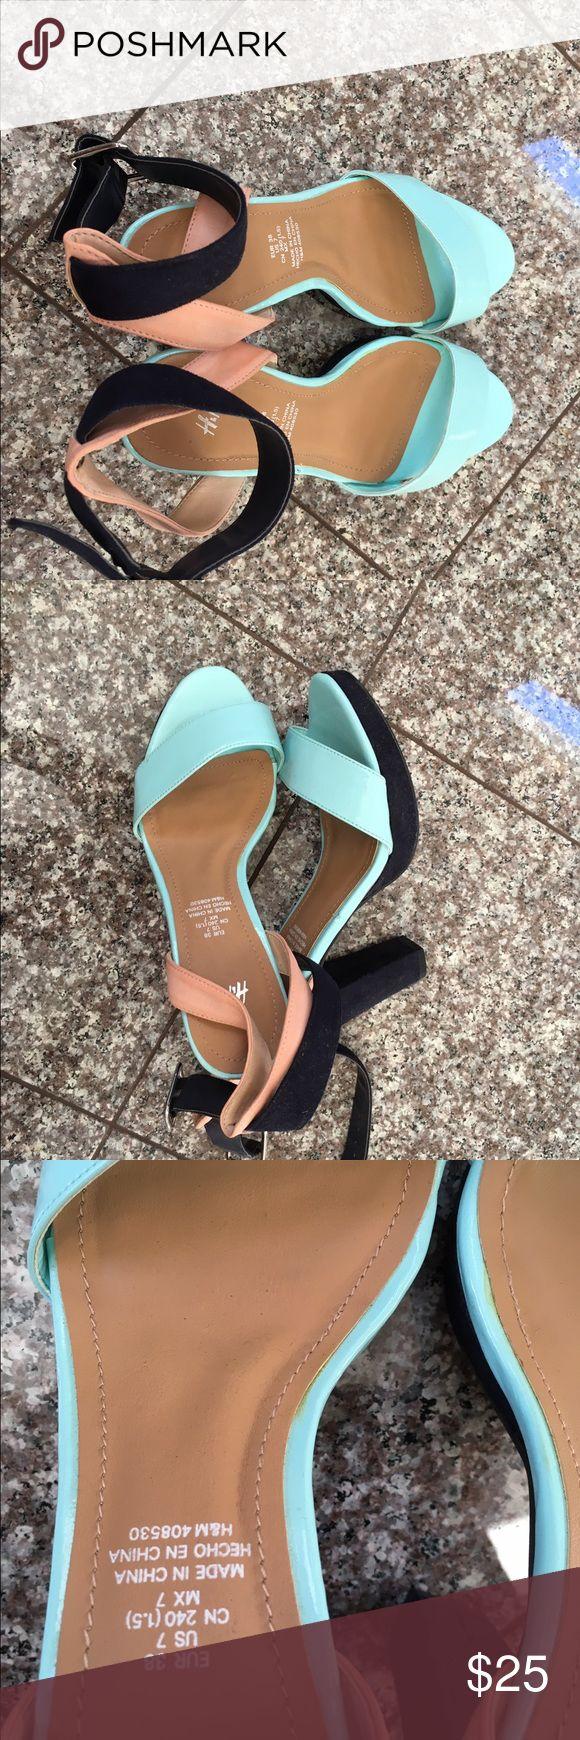 Blue and beige wedges H&M blue and beige wedges size: US 7 H&M Shoes Wedges